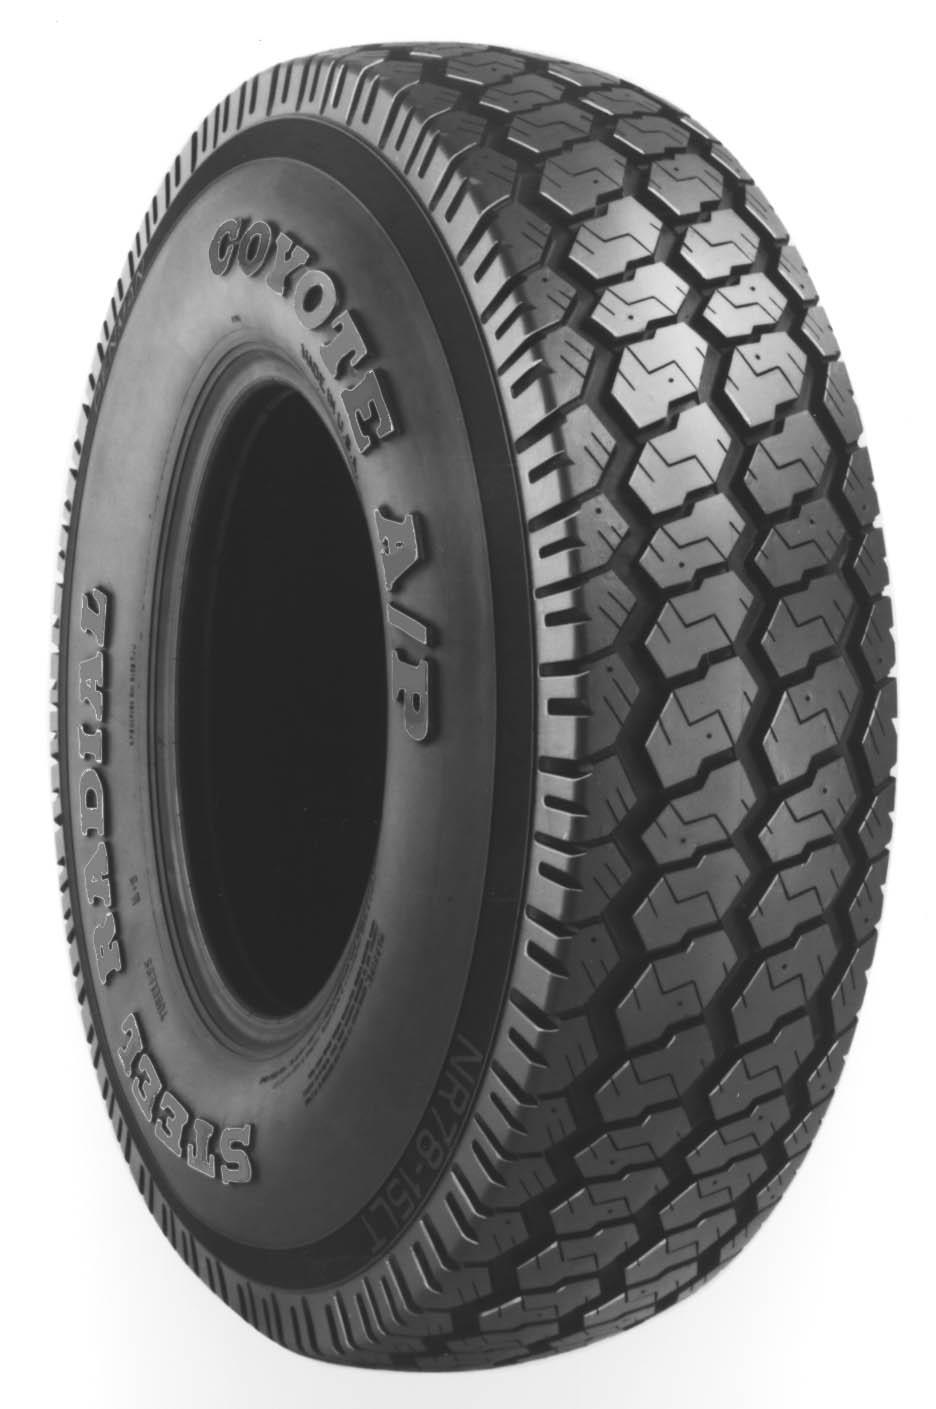 35-mud-king-tires2